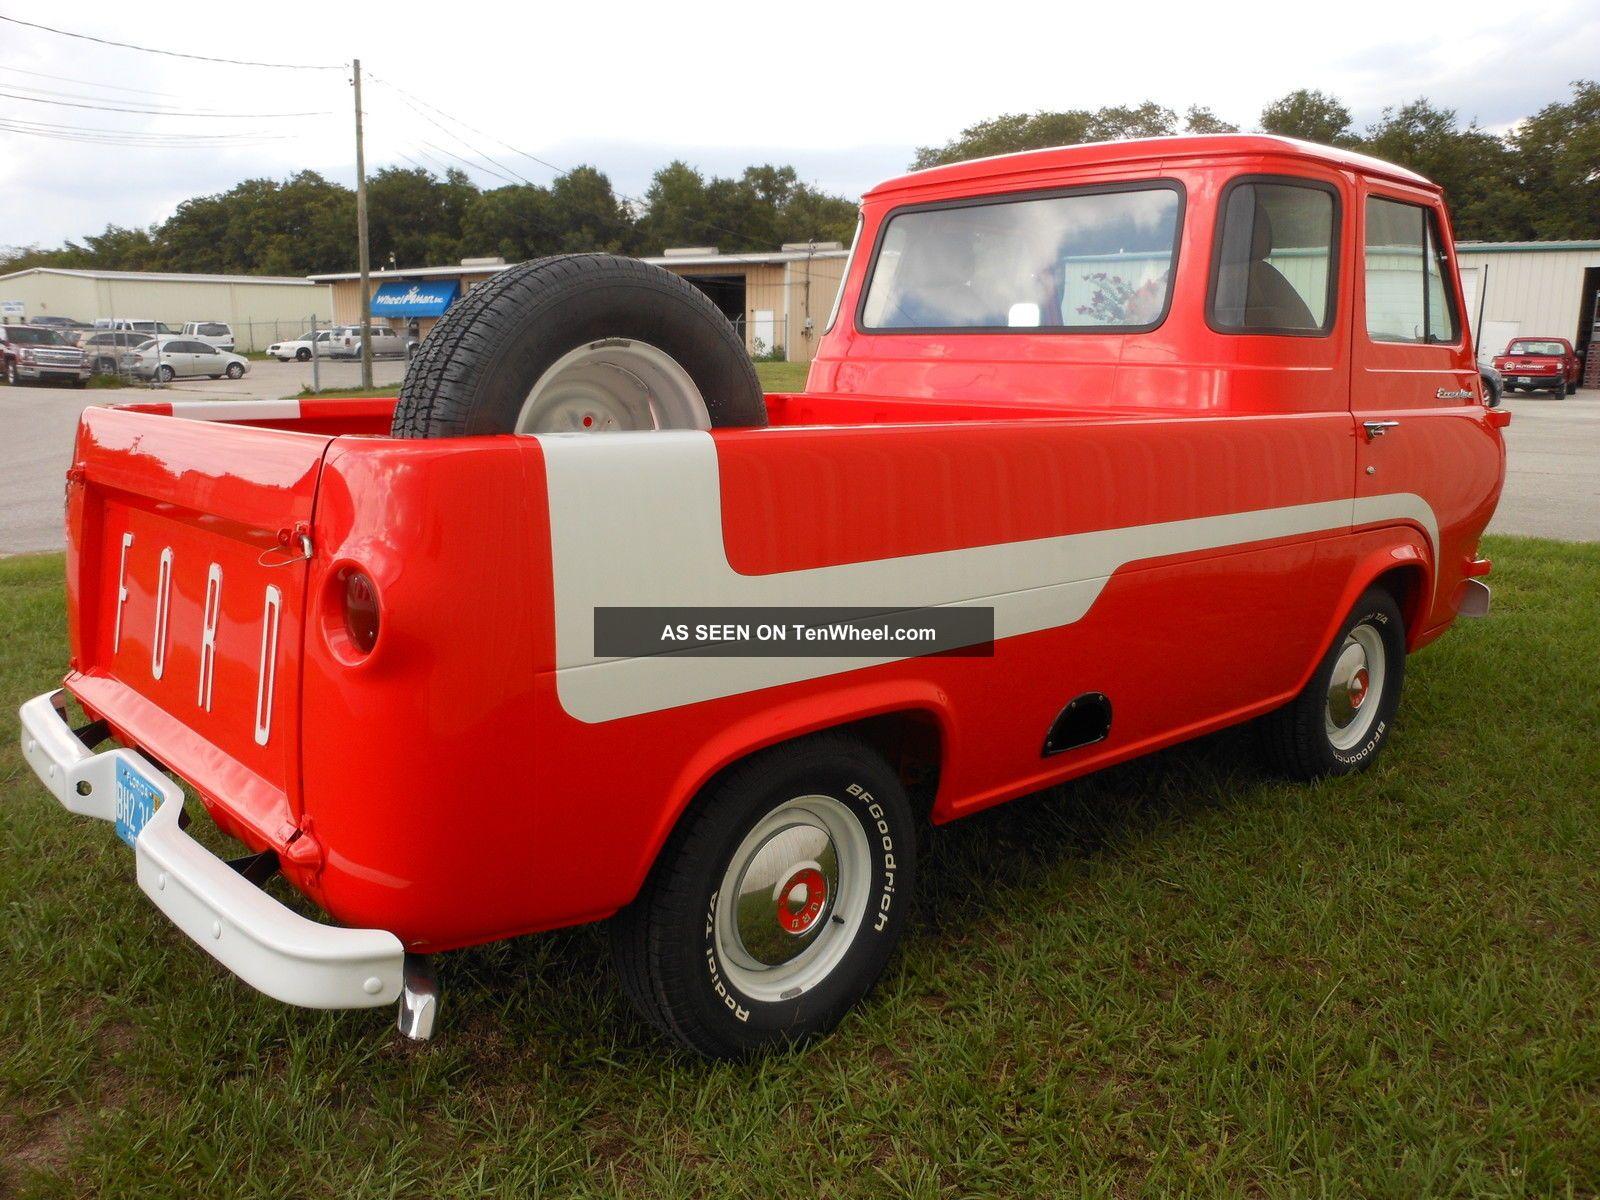 1966 Ford Econoline Pick Up Truck Collector, Orange  Ford Econoline Pickup Trucks